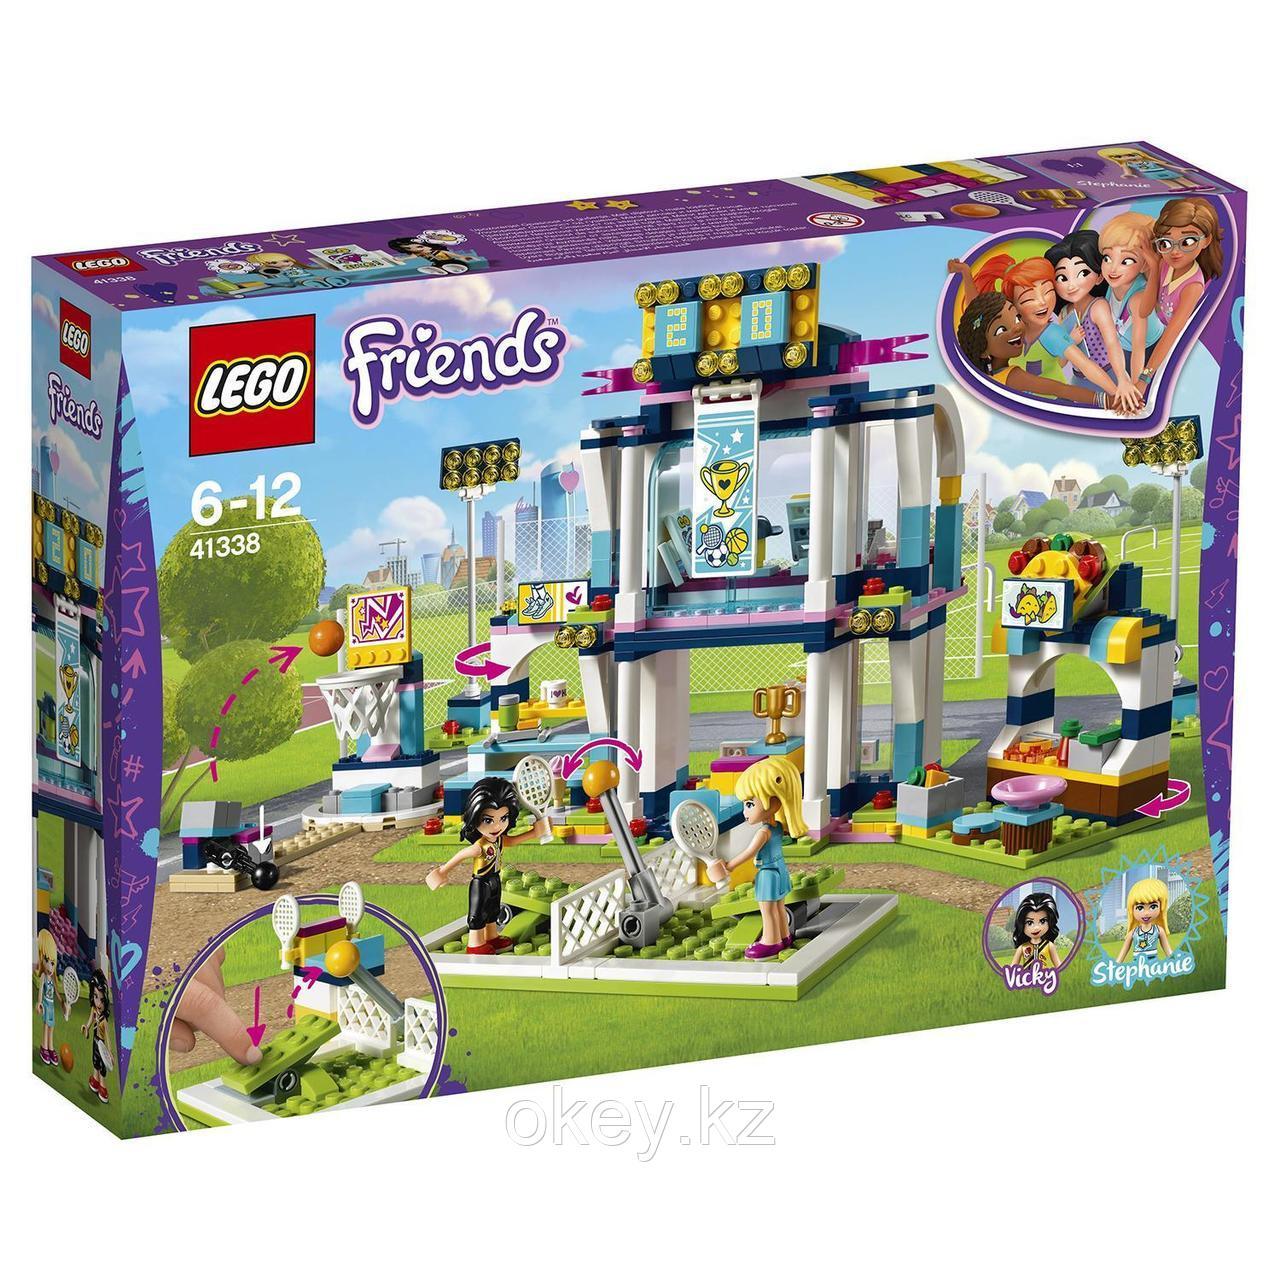 LEGO Friends: Спортивная арена для Стефани 41338